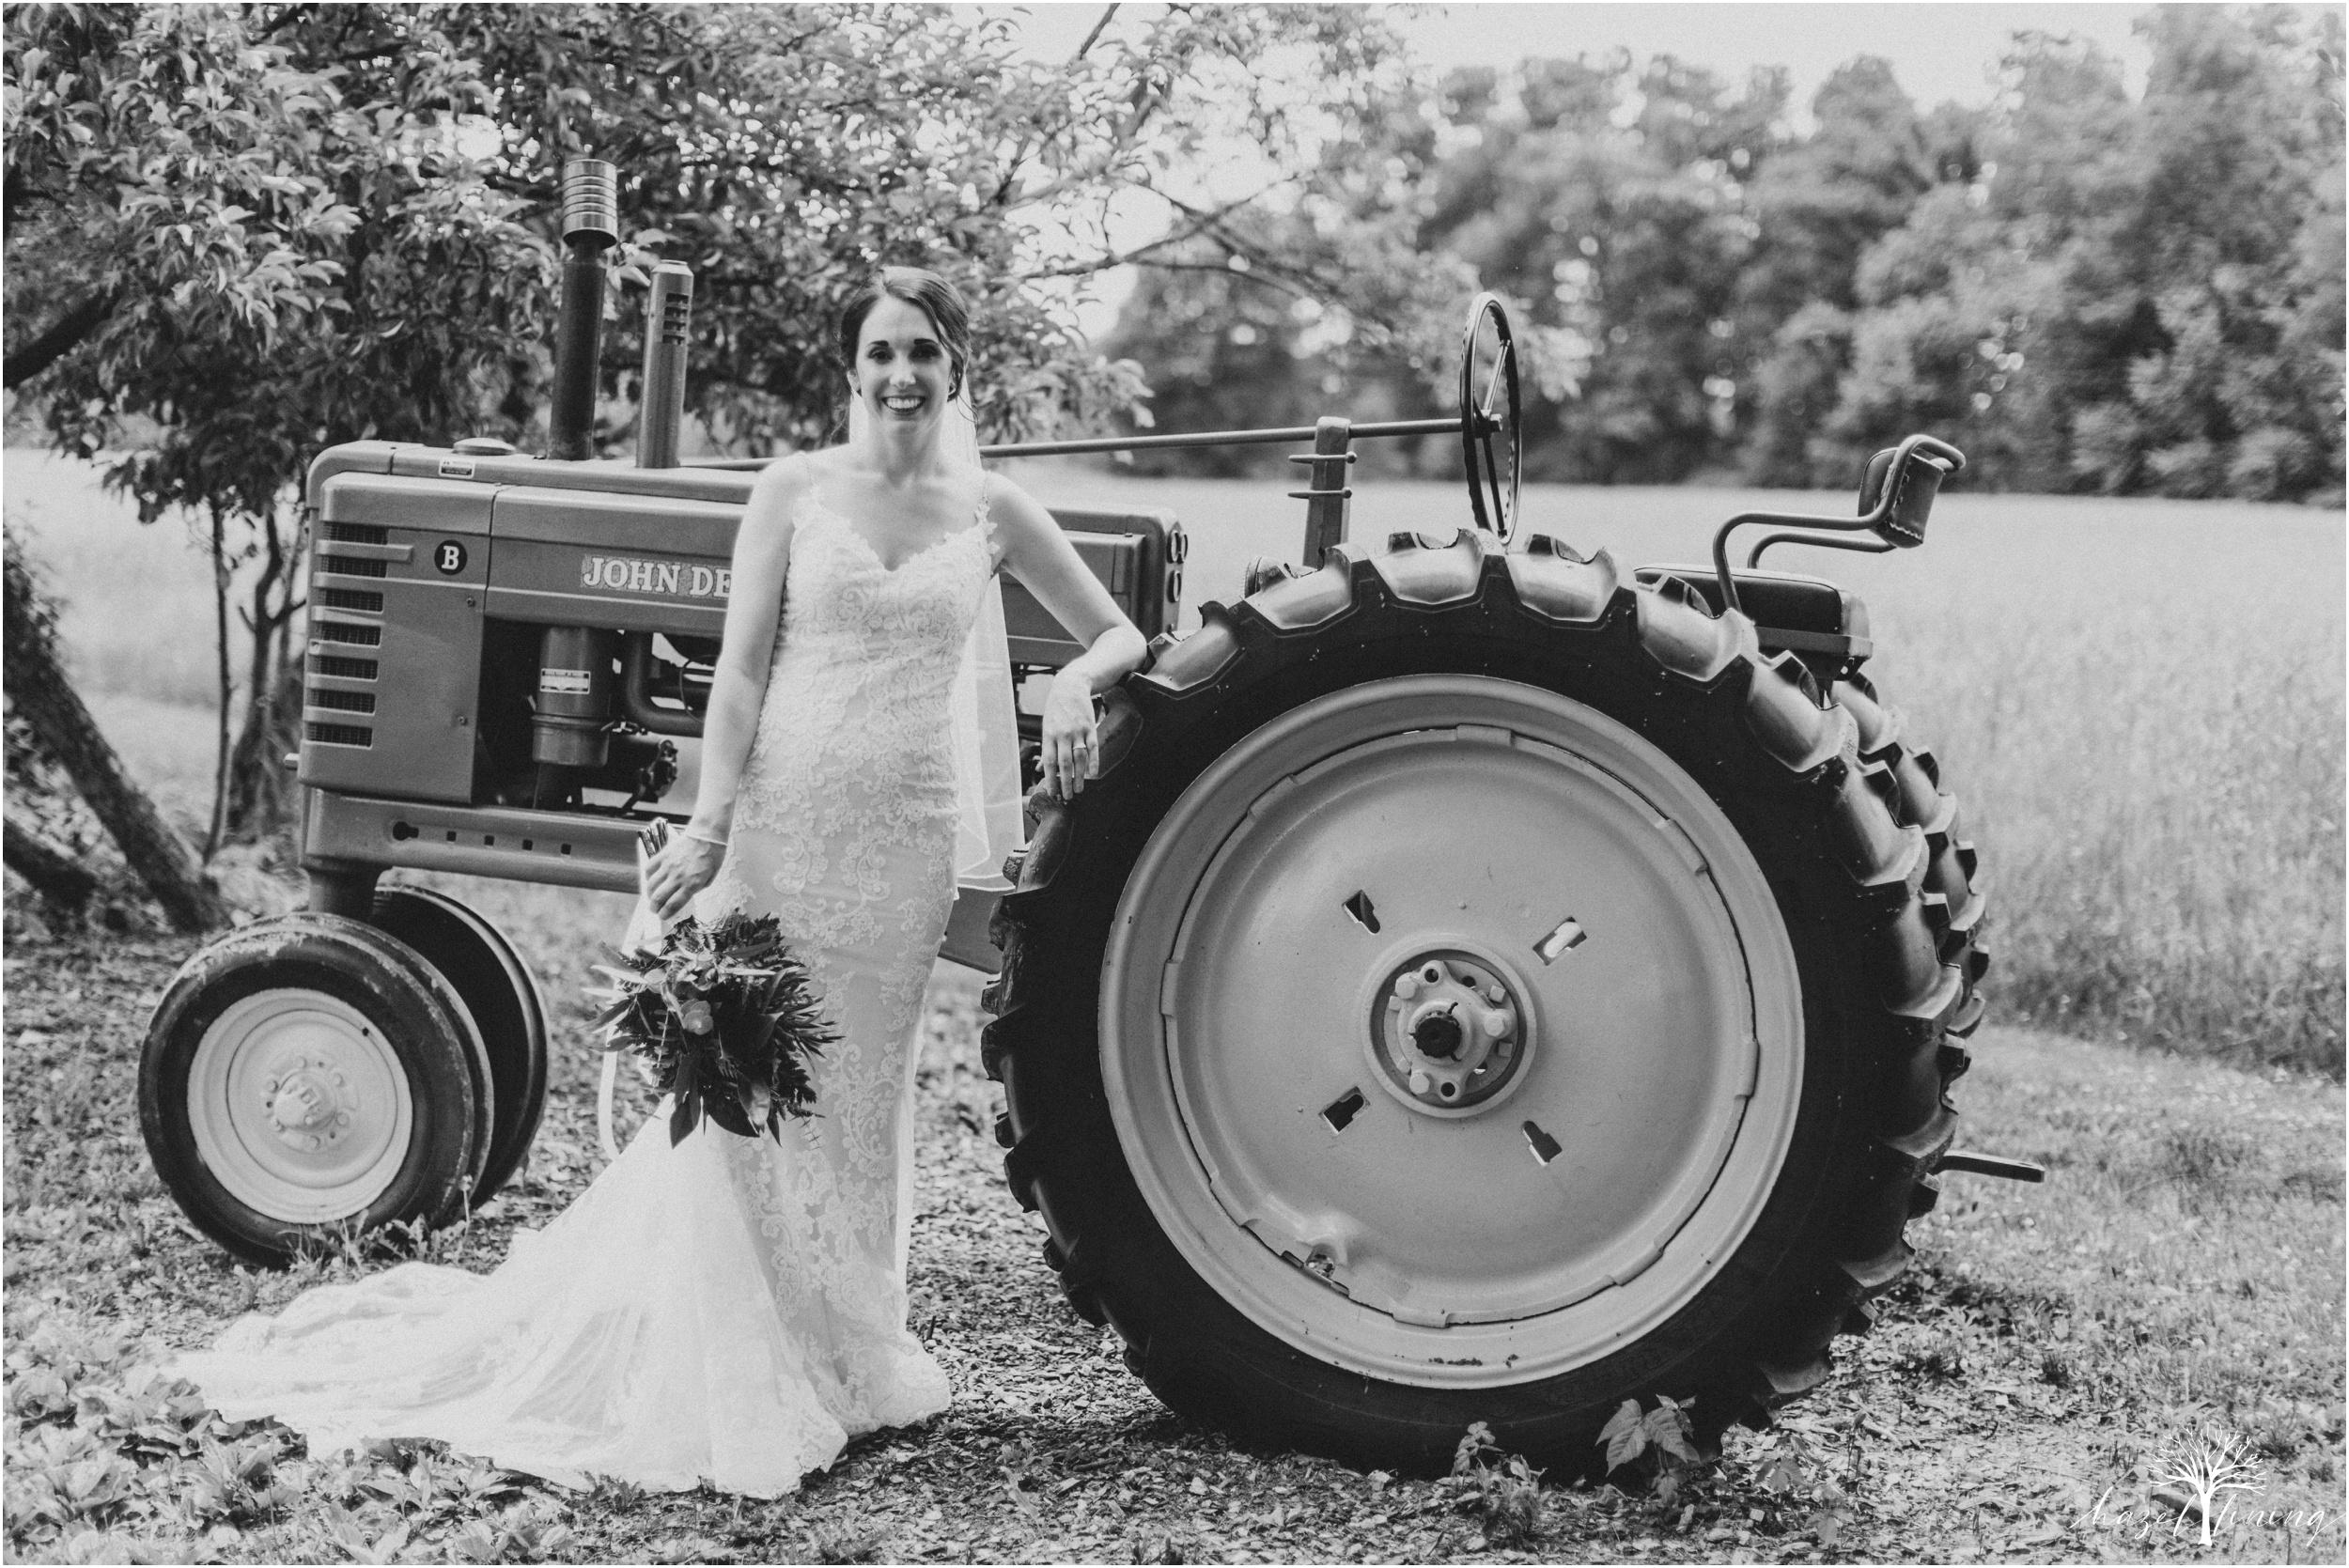 hazel-lining-travel-wedding-elopement-photography-lisa-landon-shoemaker-the-farm-bakery-and-events-bucks-county-quakertown-pennsylvania-summer-country-outdoor-farm-wedding_0017.jpg